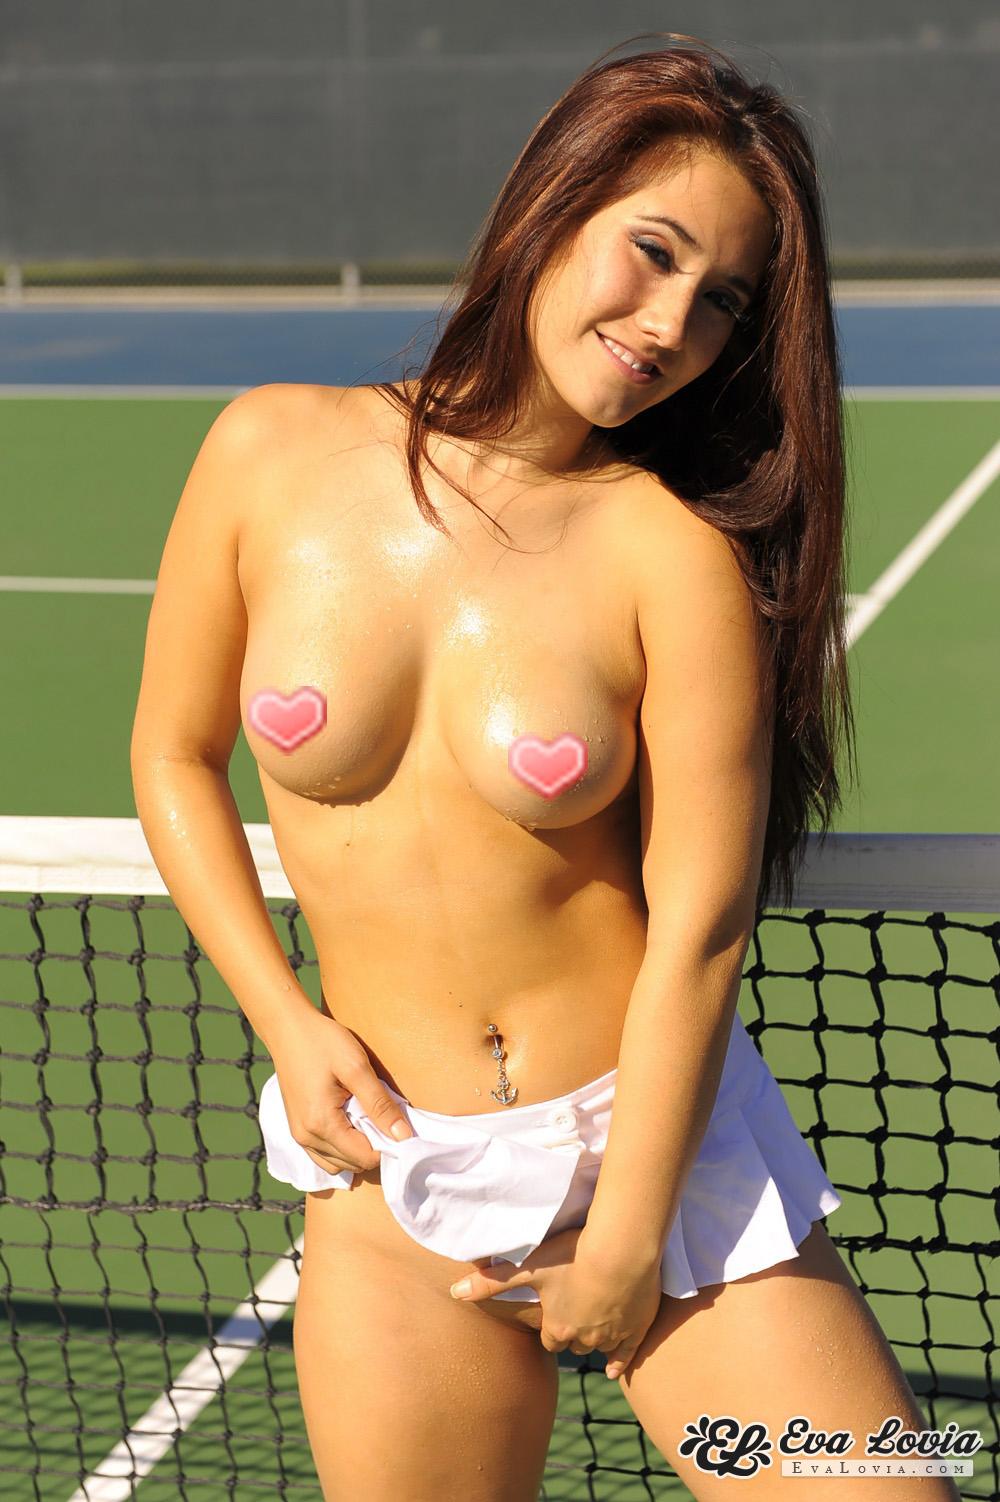 Tennis Players Nude Photos